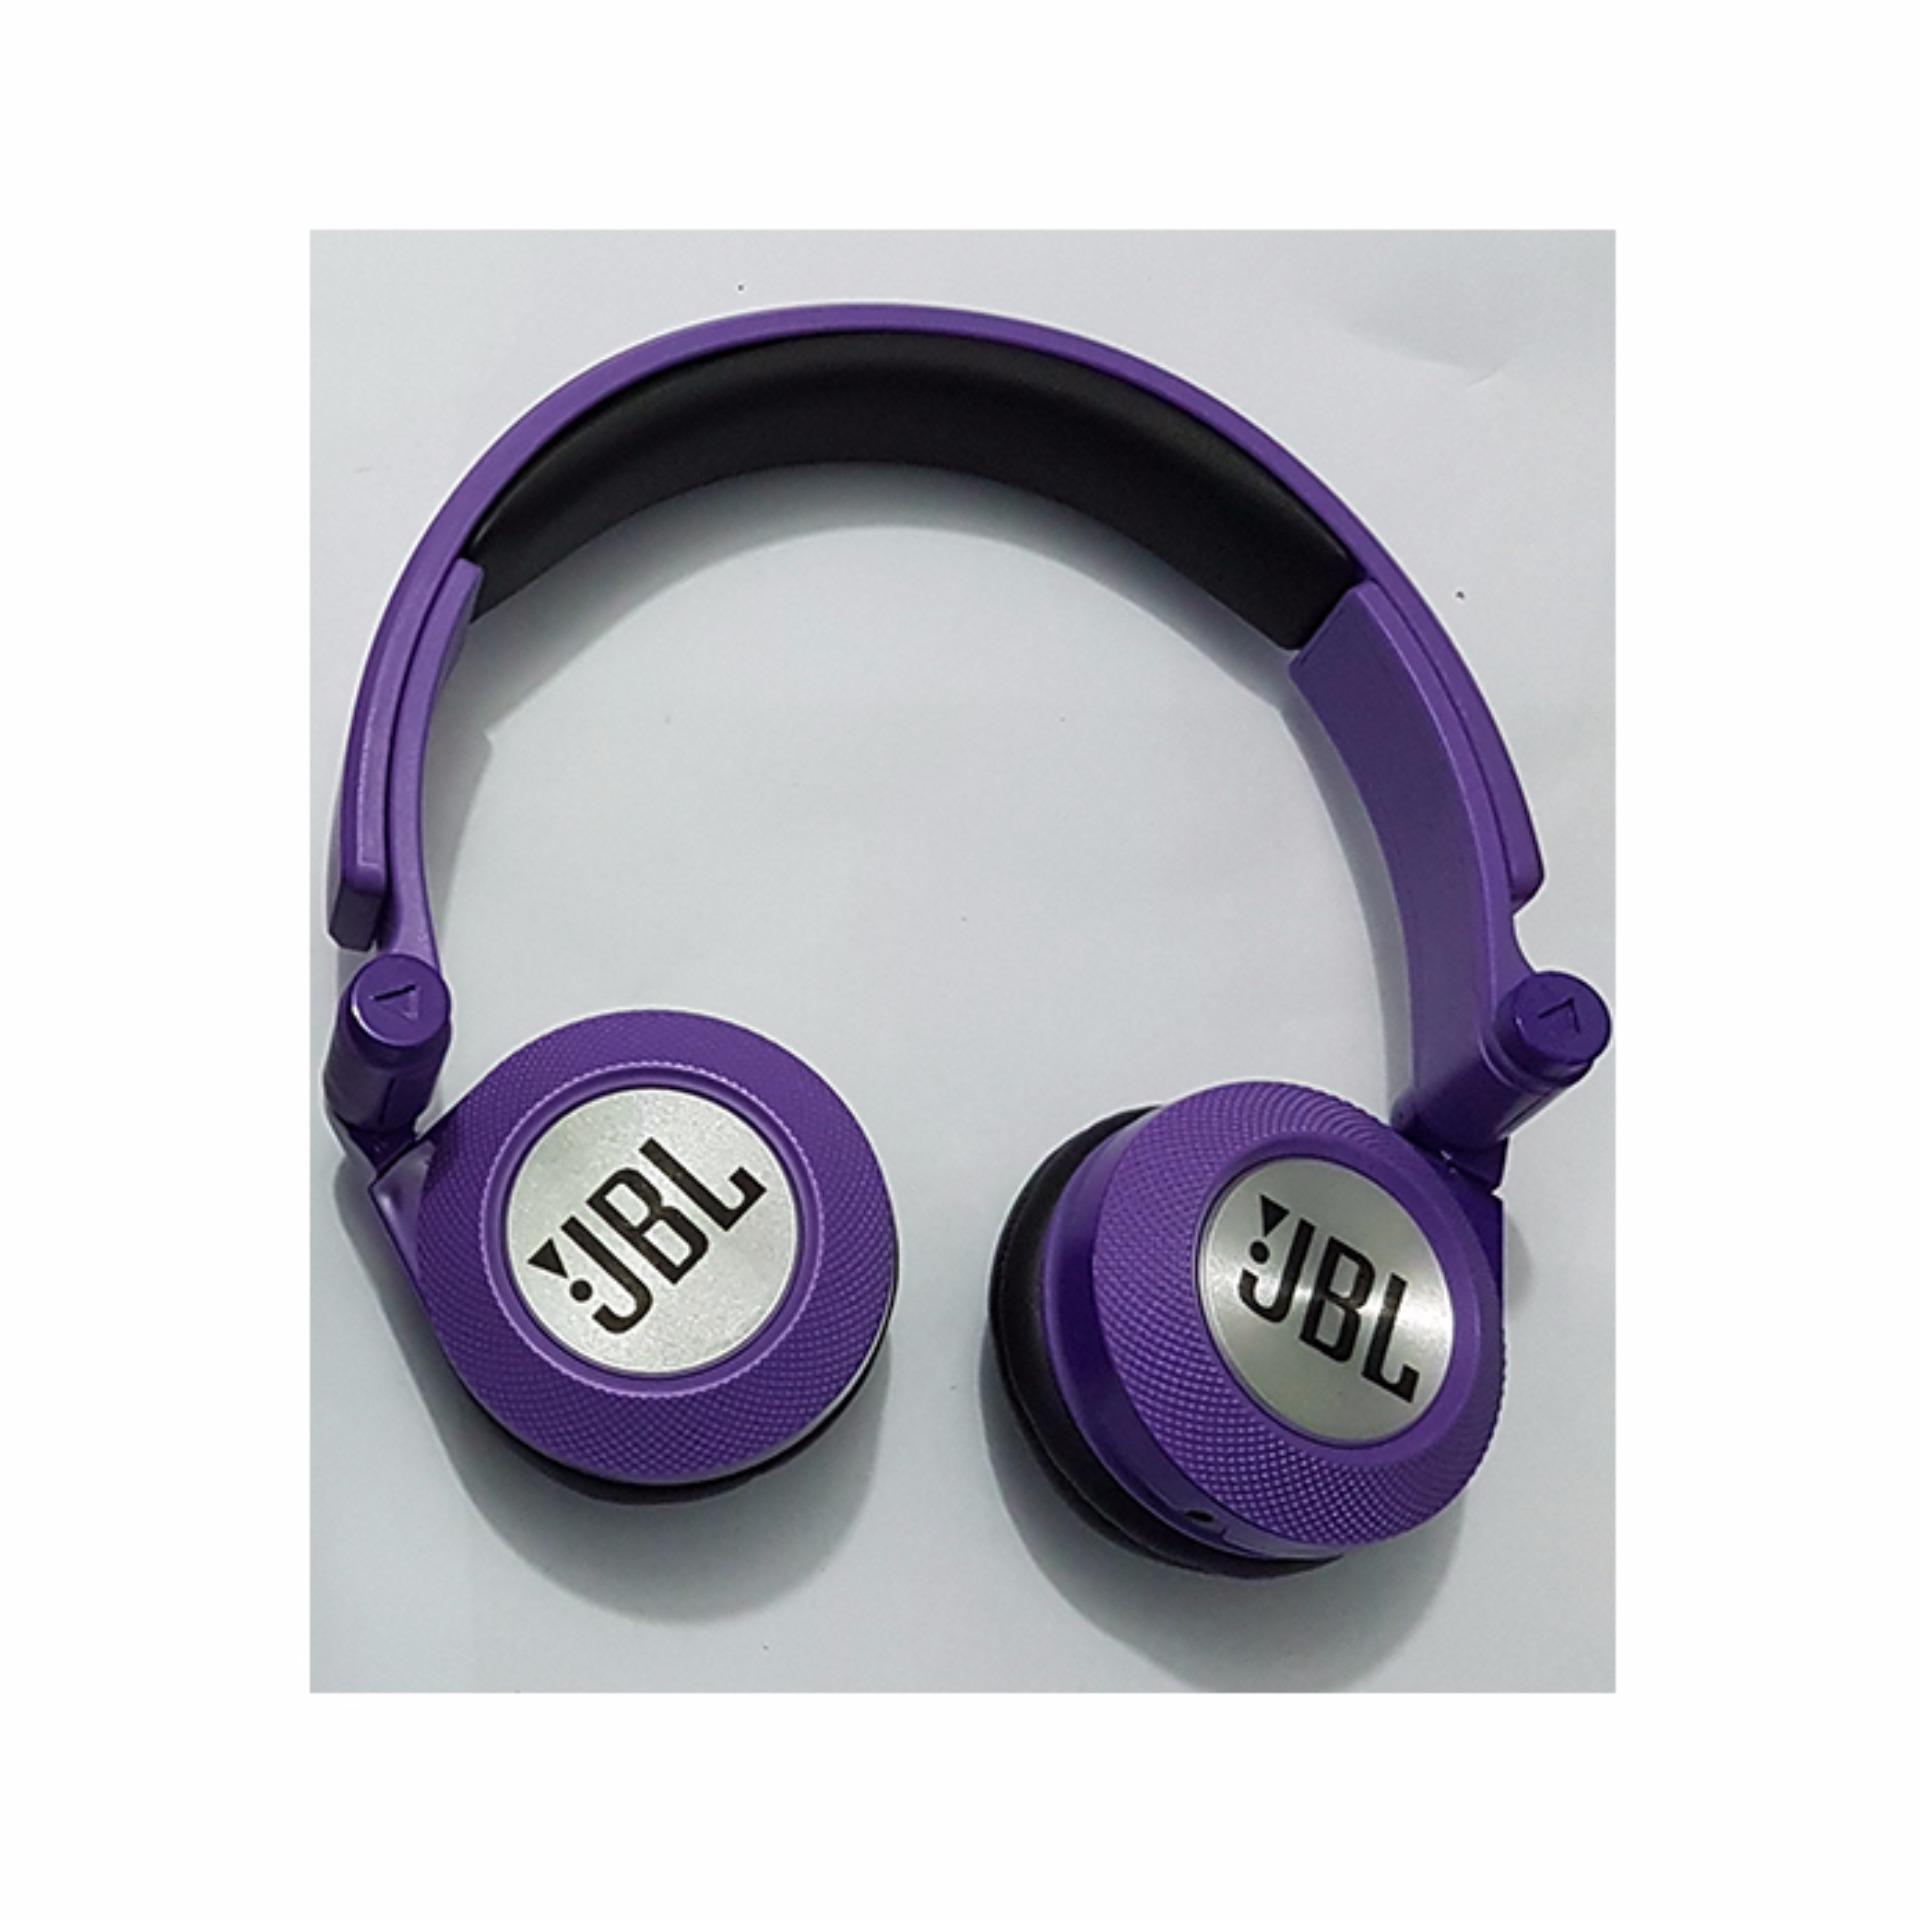 Perbandingan Harga Jbl Headset Stereo Synchros E30 Pencarian Termurah